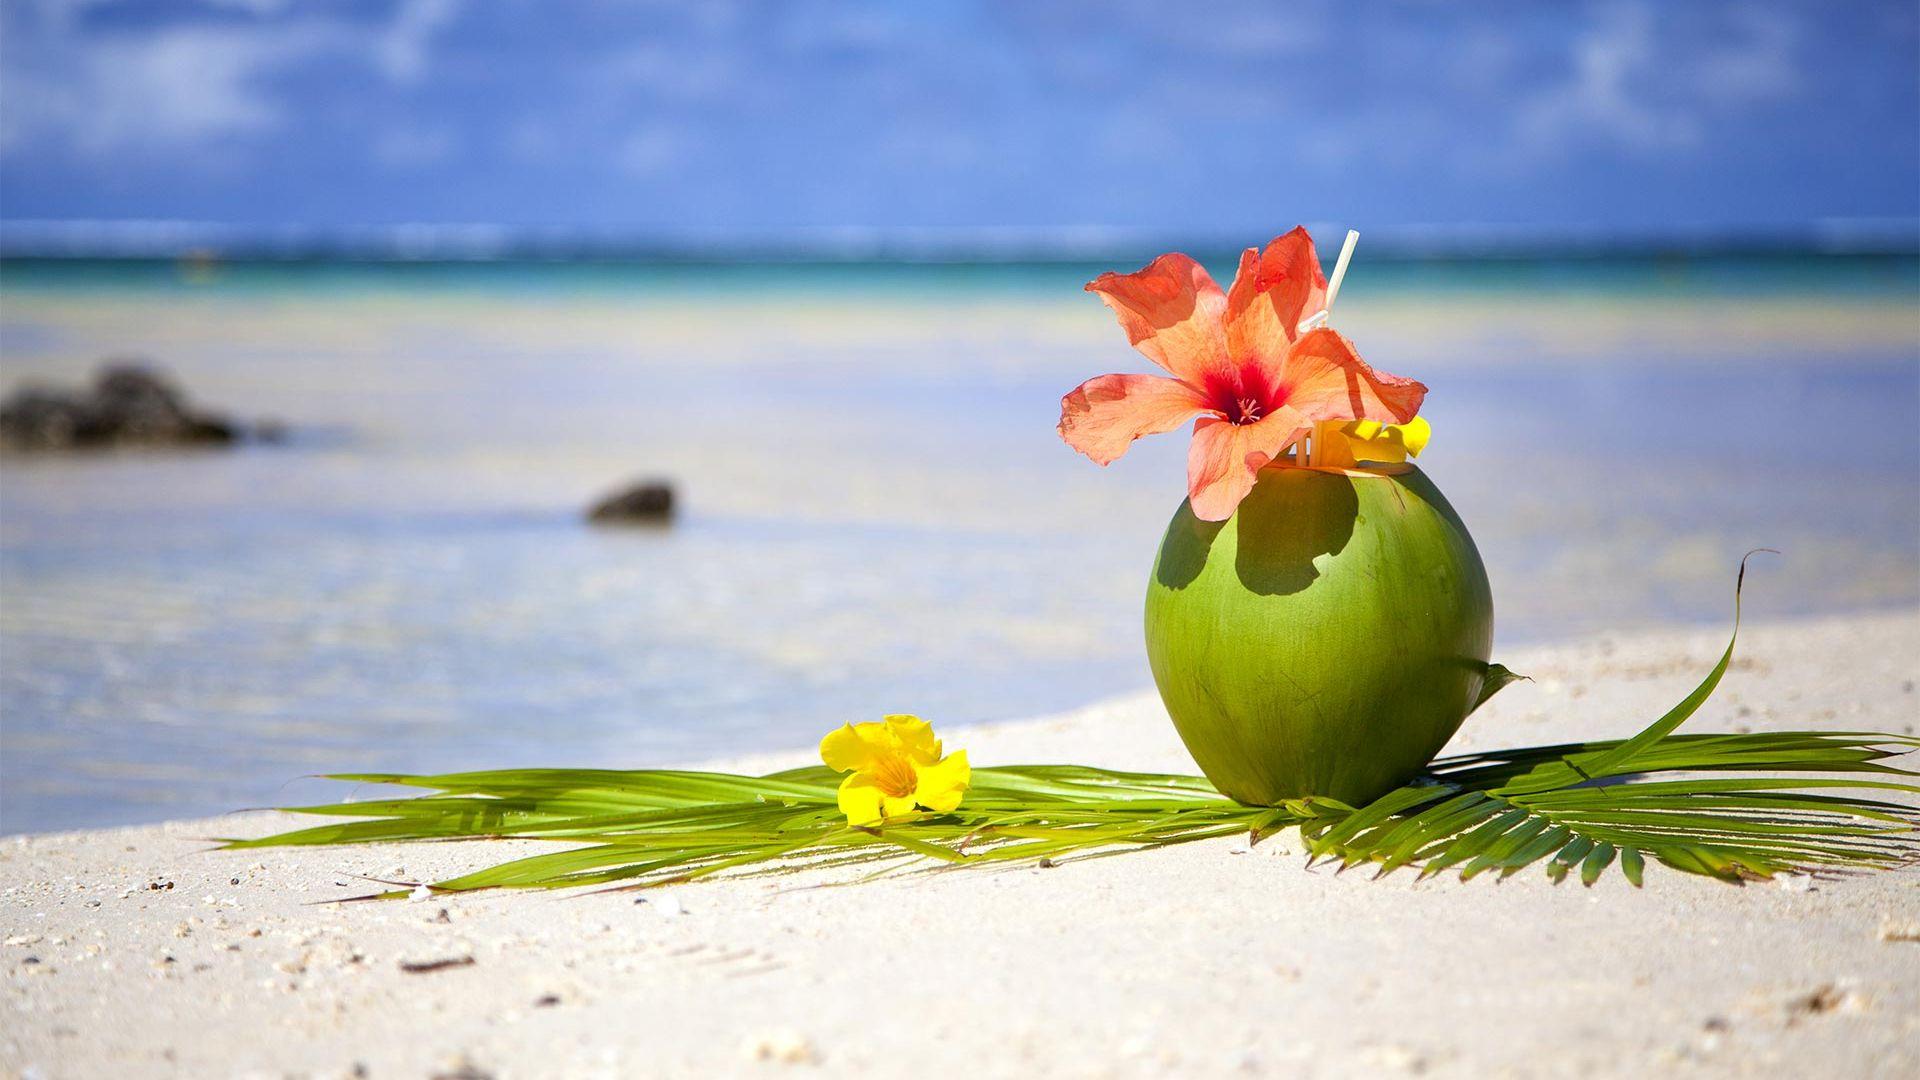 Revelion 2022 - Sejur Luxury Constance Belle Mare Plage, Mauritius, 11 zile - cu Razvan Pascu